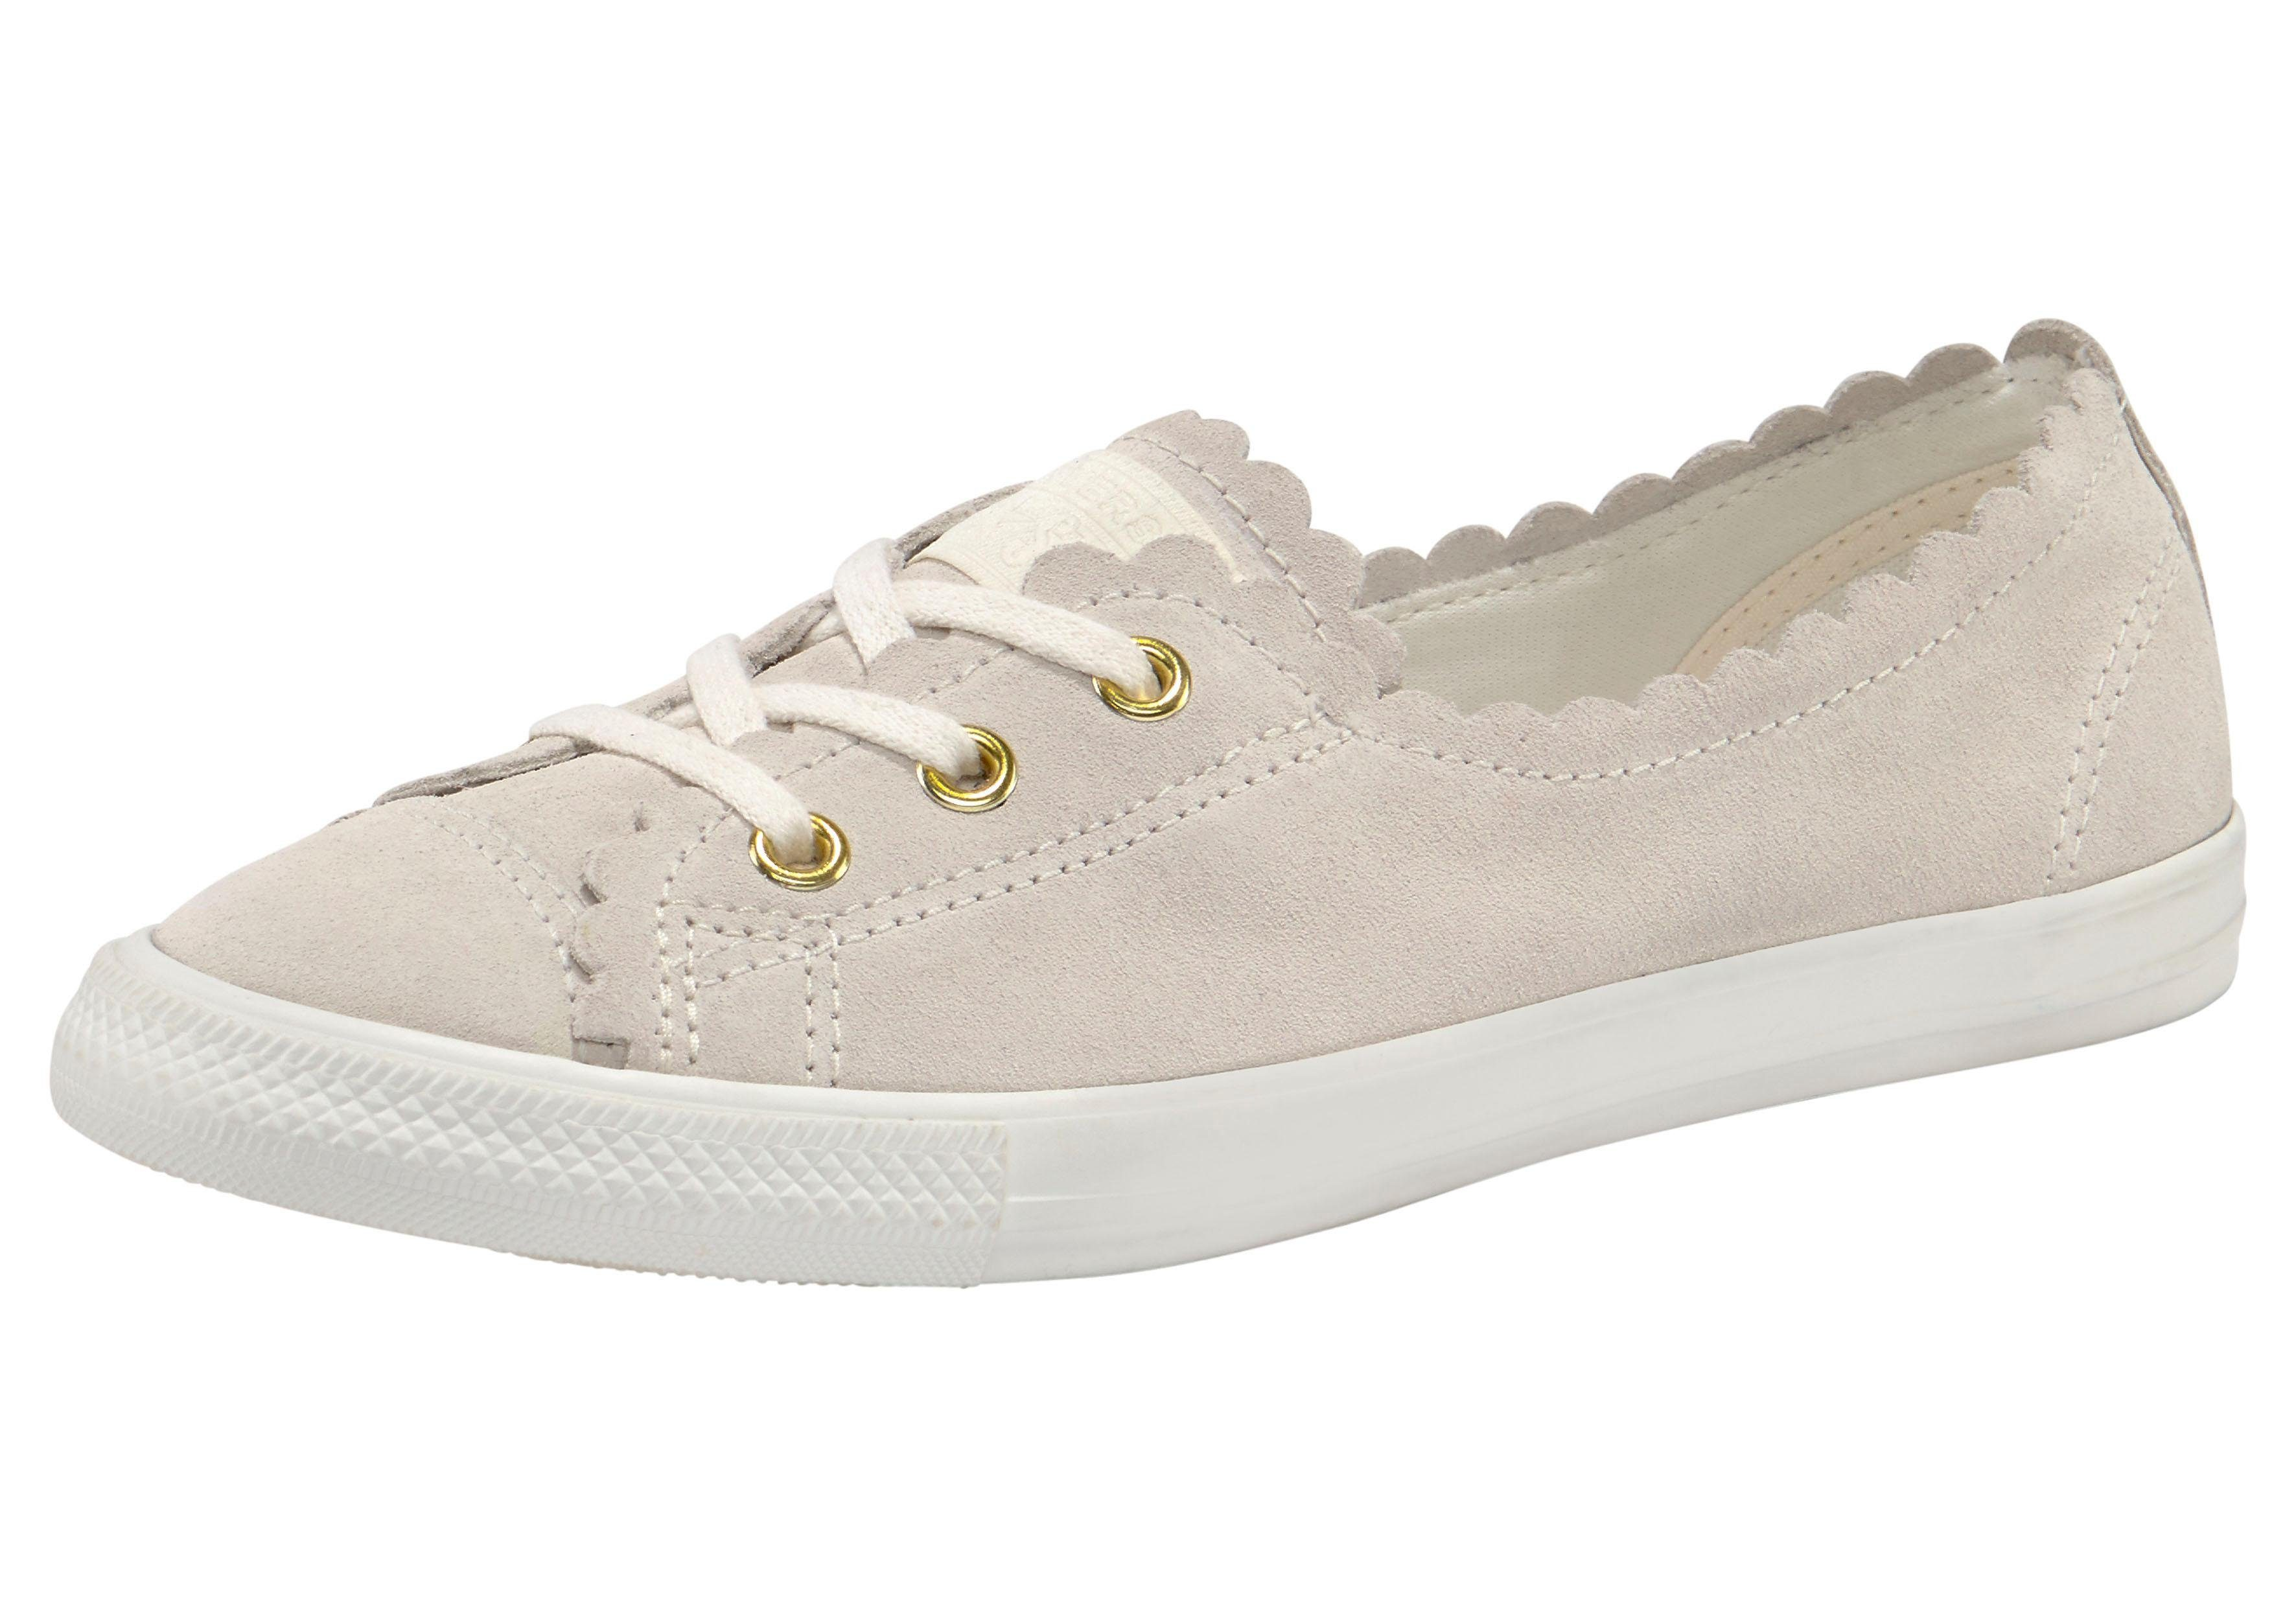 Converse »Chuck Taylor All Star Ballet Lace Ox Seasonal« Sneaker online kaufen   OTTO